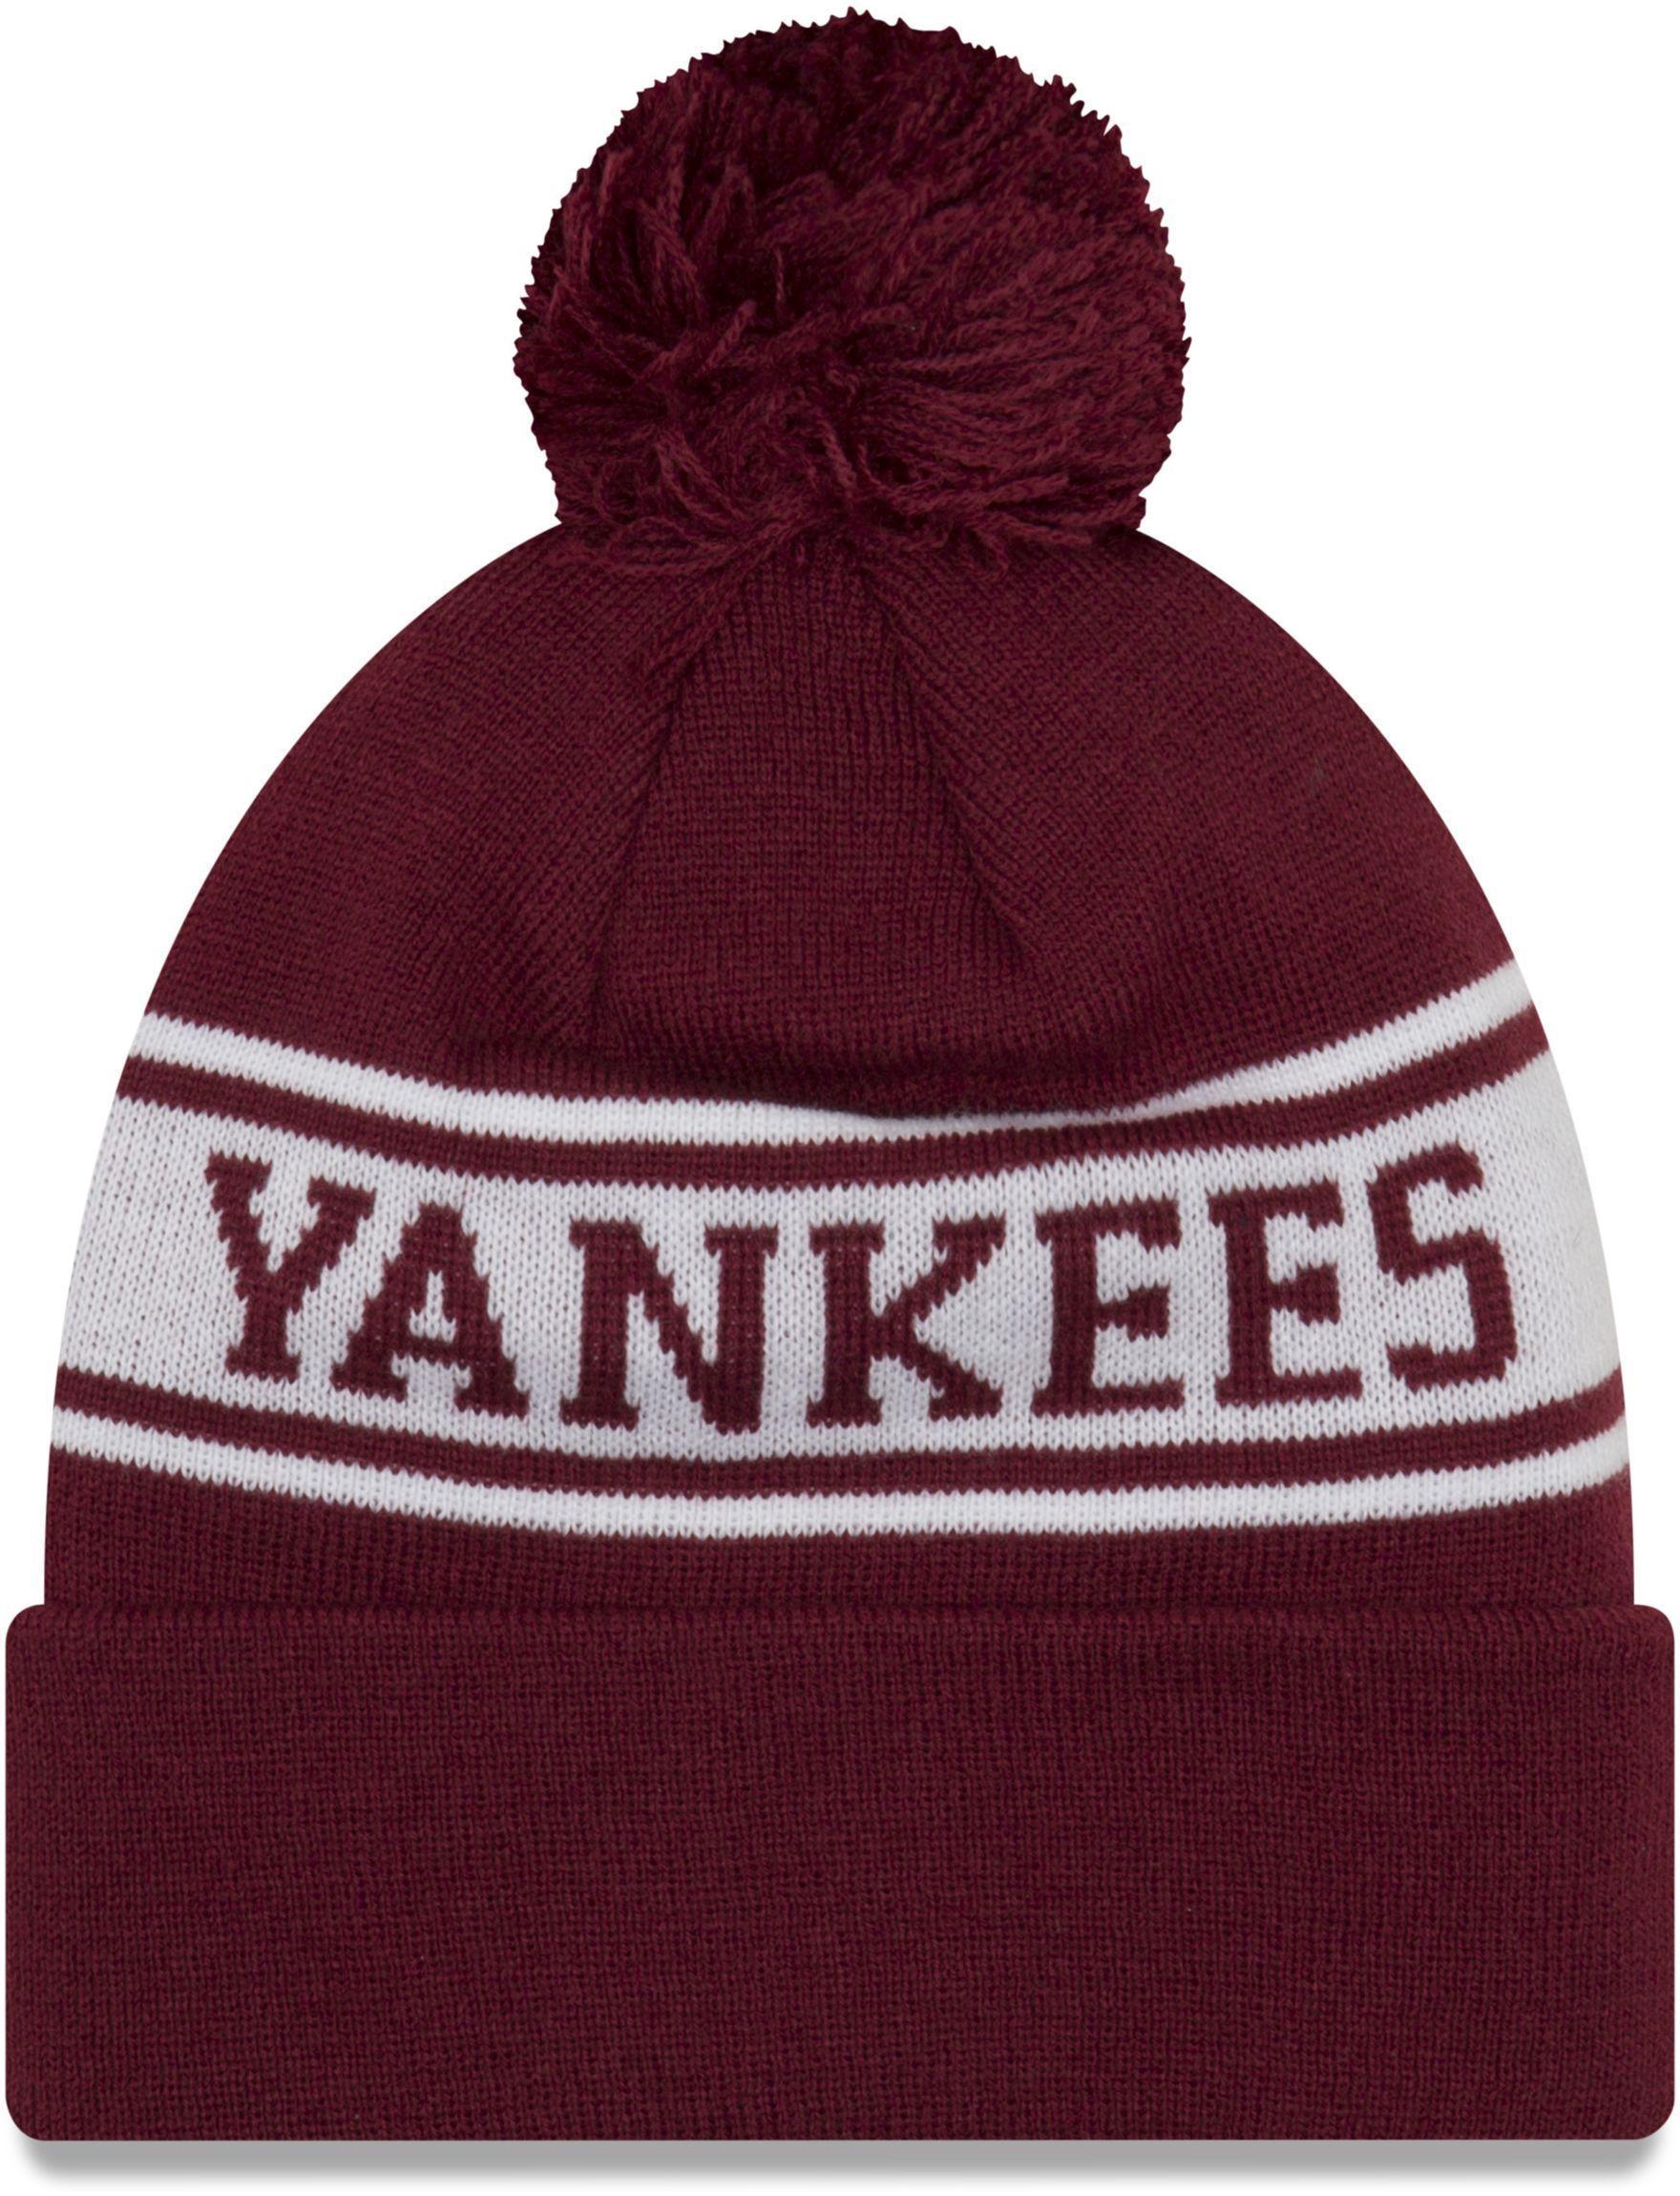 48f740bbf3a4bb KTZ New York Yankees Seasonal Jake Bobble Beanie Hat in Red for Men - Lyst